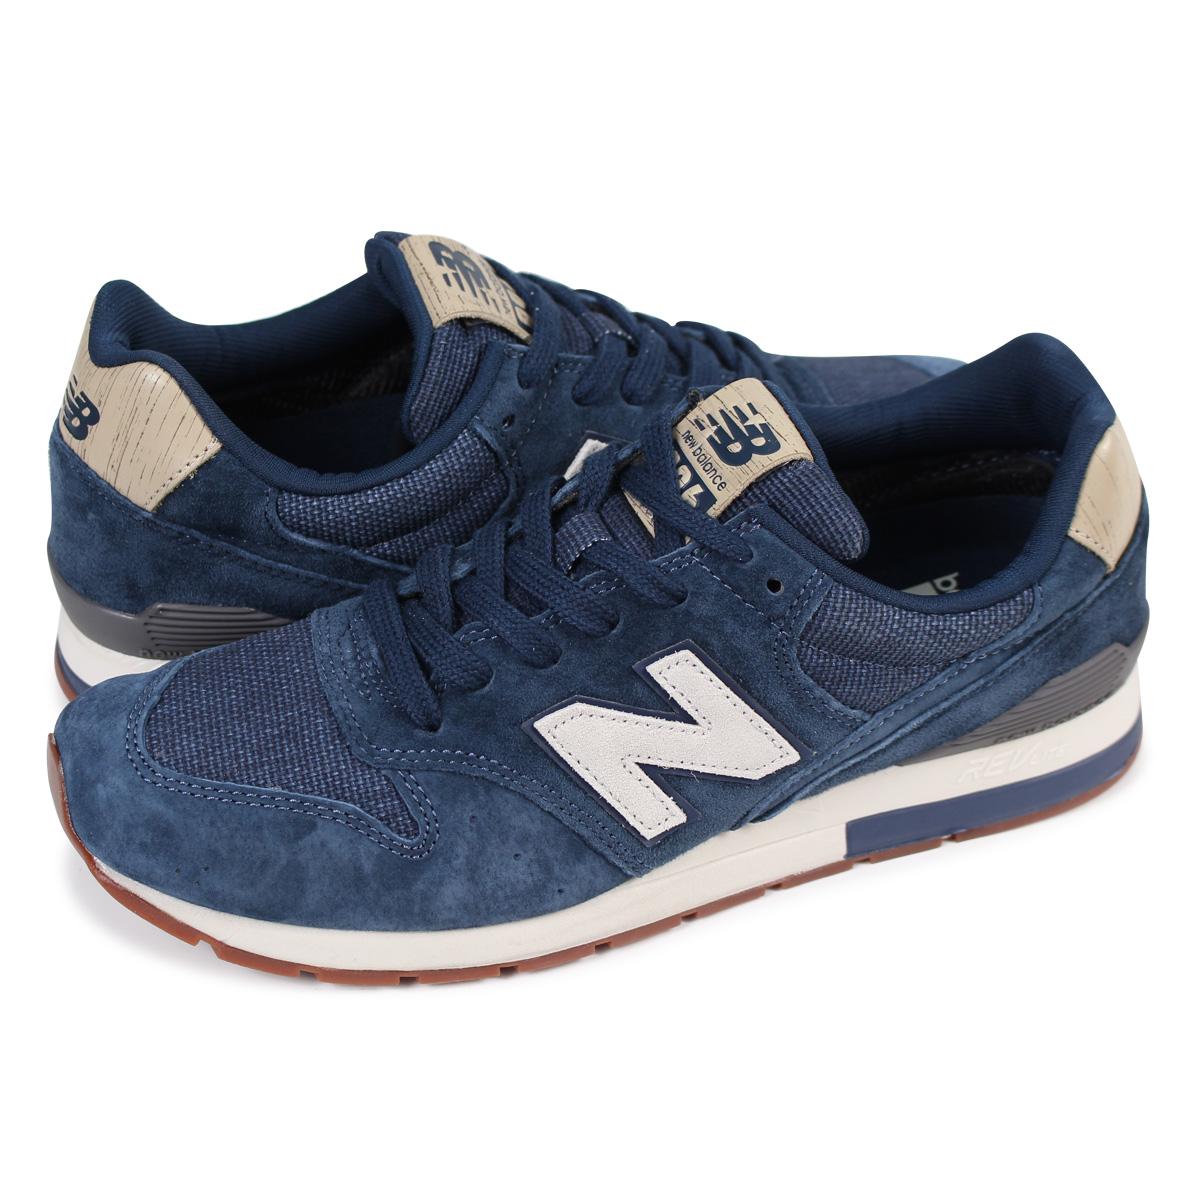 new balance mrl996pb new balance 996 mens ladys sneakers d wise blue 220 shinnyu load 182